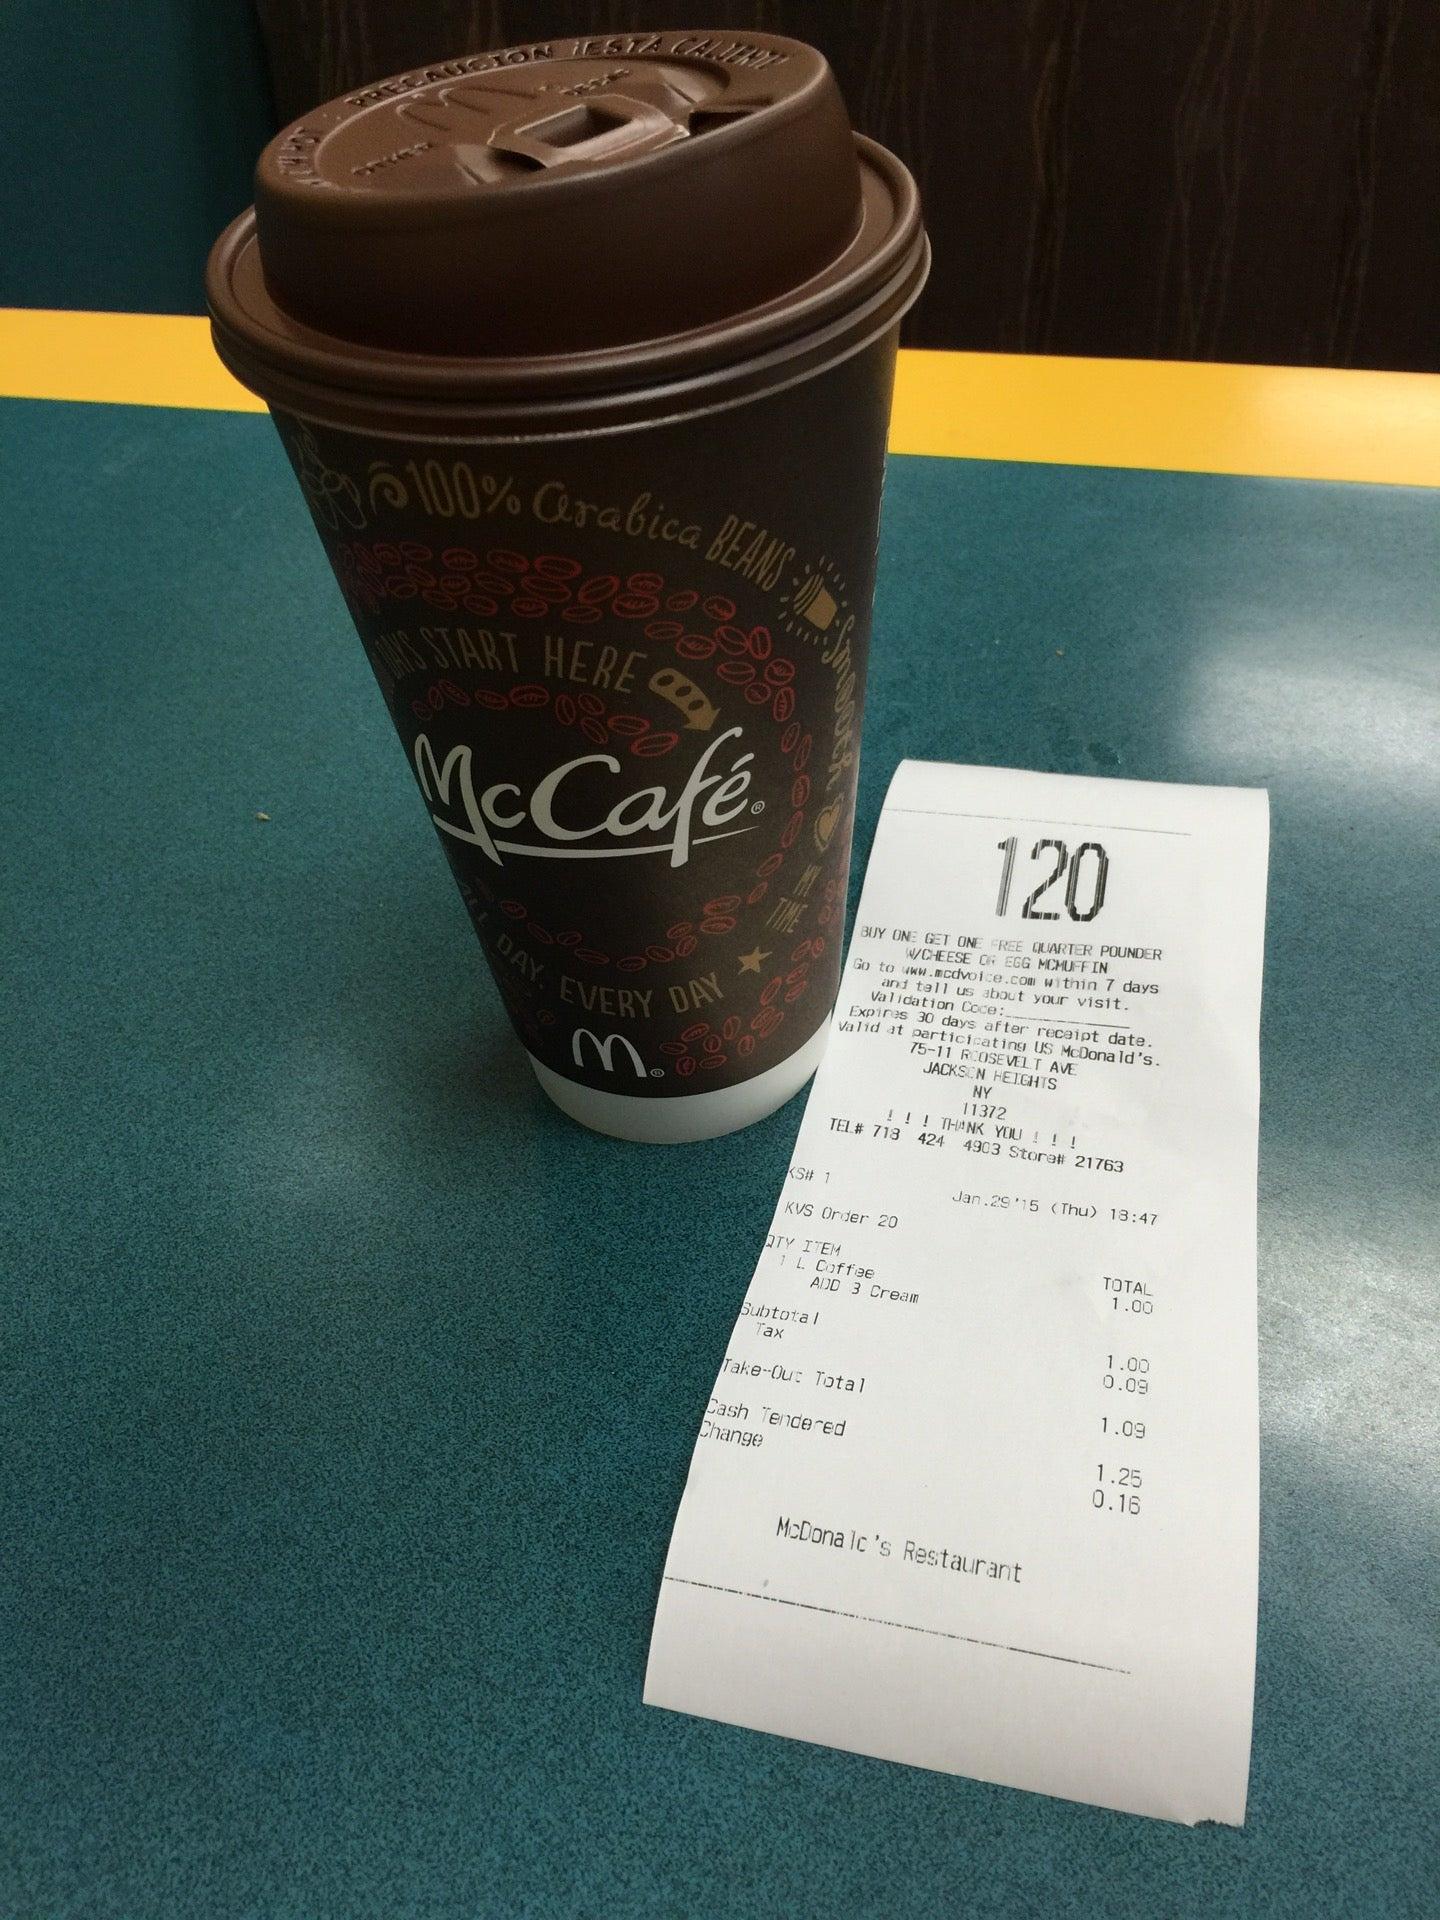 McDonald's,breakfast,burgers,coffee,fast food,french fries,mcdonalds